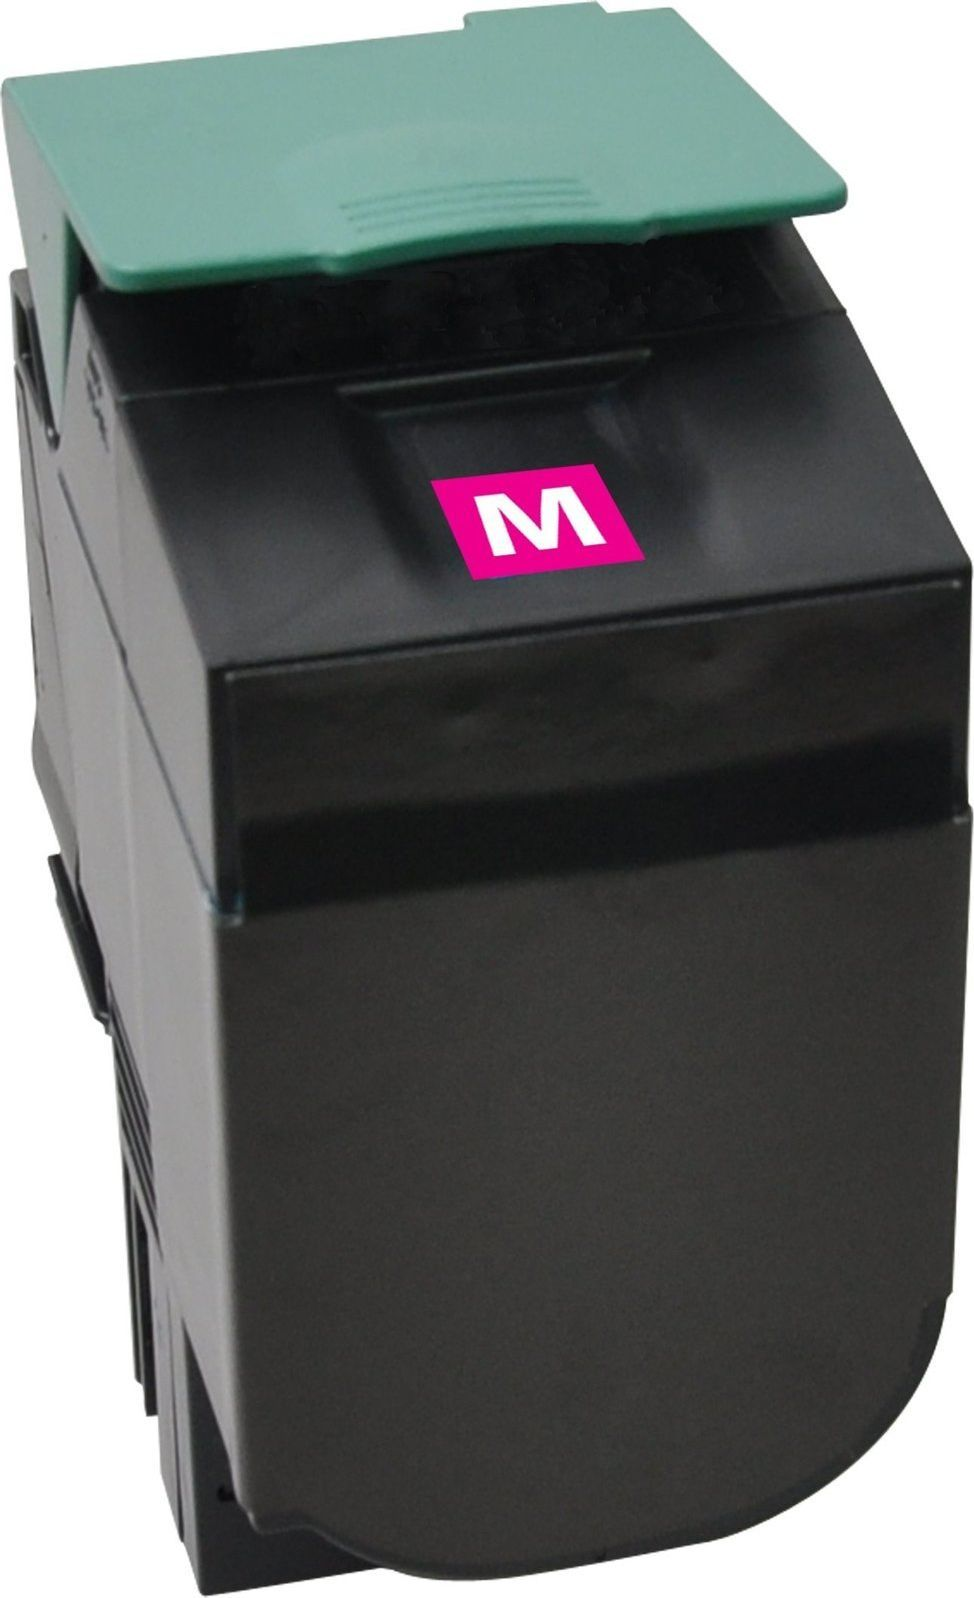 Quality Imaging Toner QI-LE1004ZM / C544X2MG (Magenta) 1